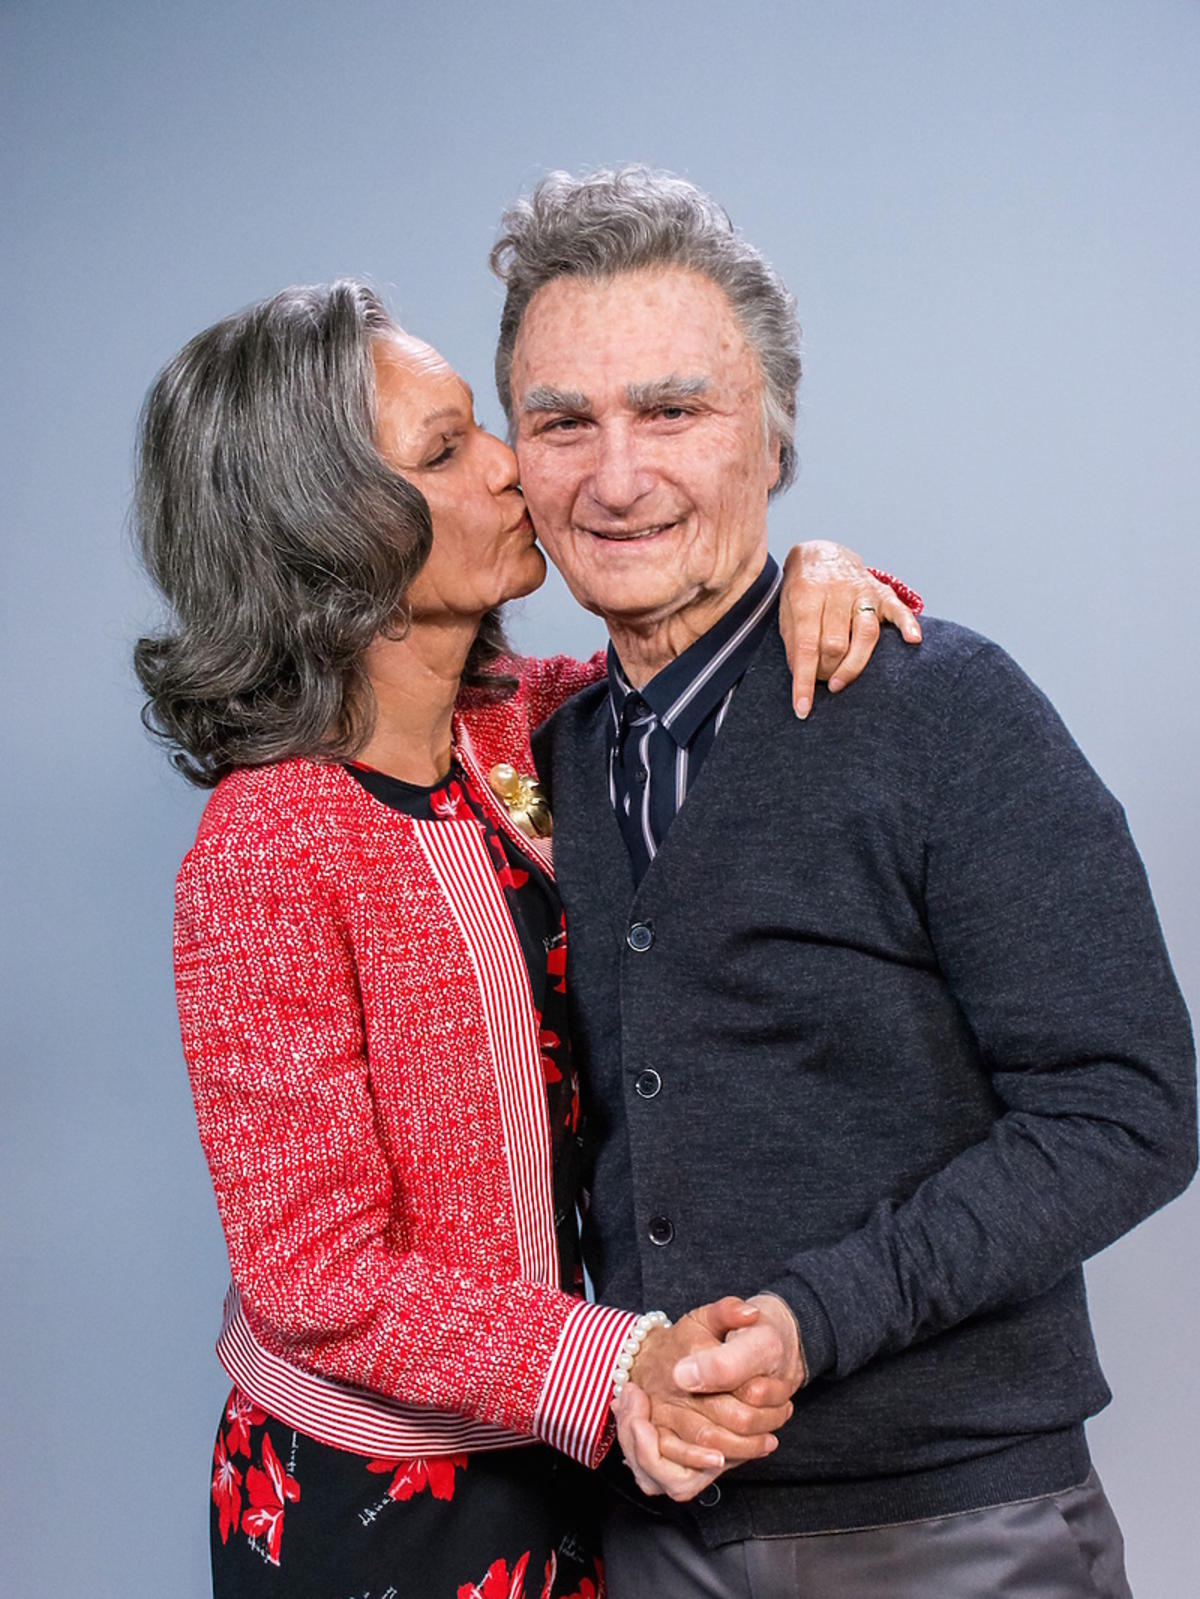 Janek 94 lat i Lenka 79 lata